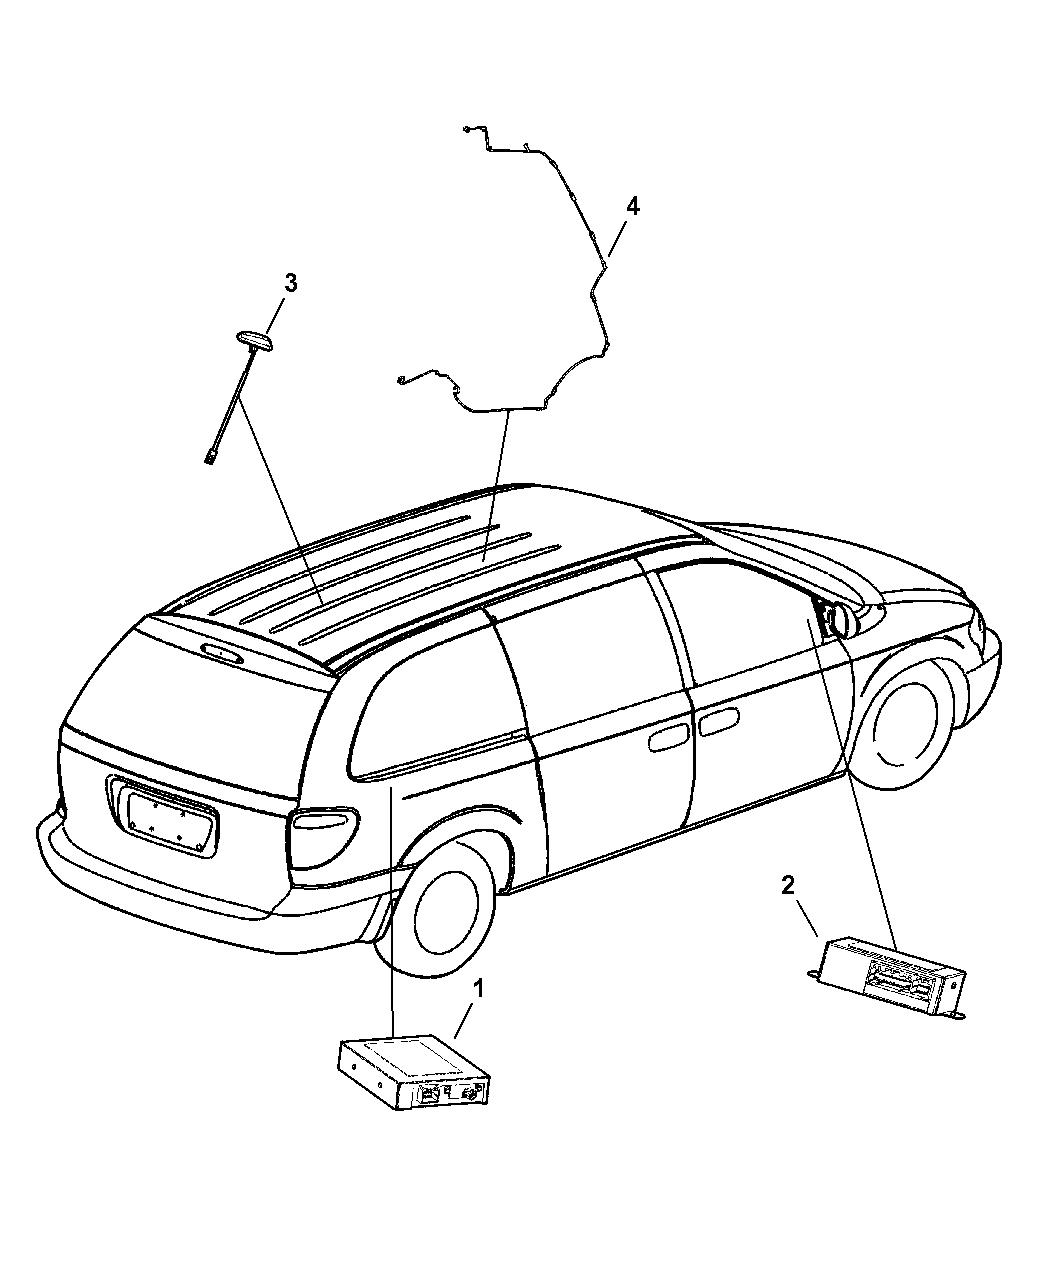 2006 Dodge Grand Caravan Satellite Radio System